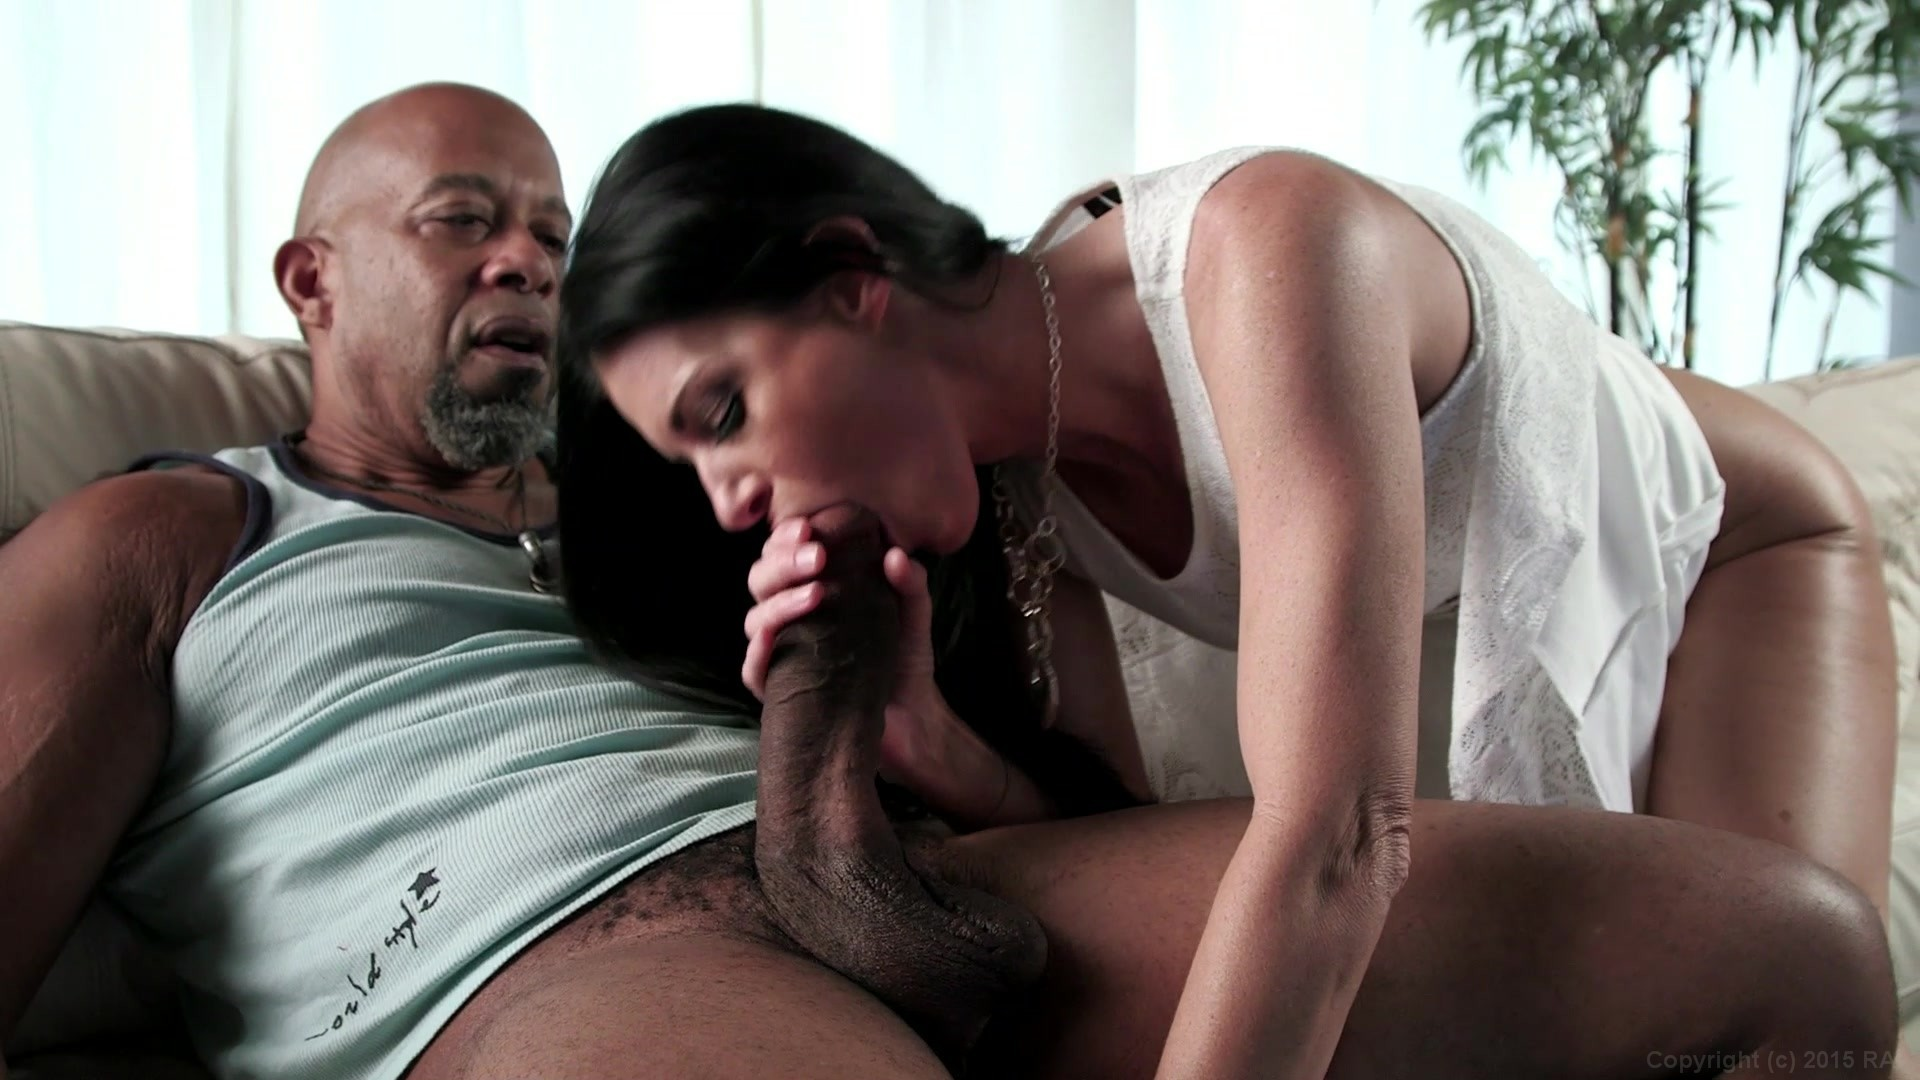 Big black cock in husbands wife